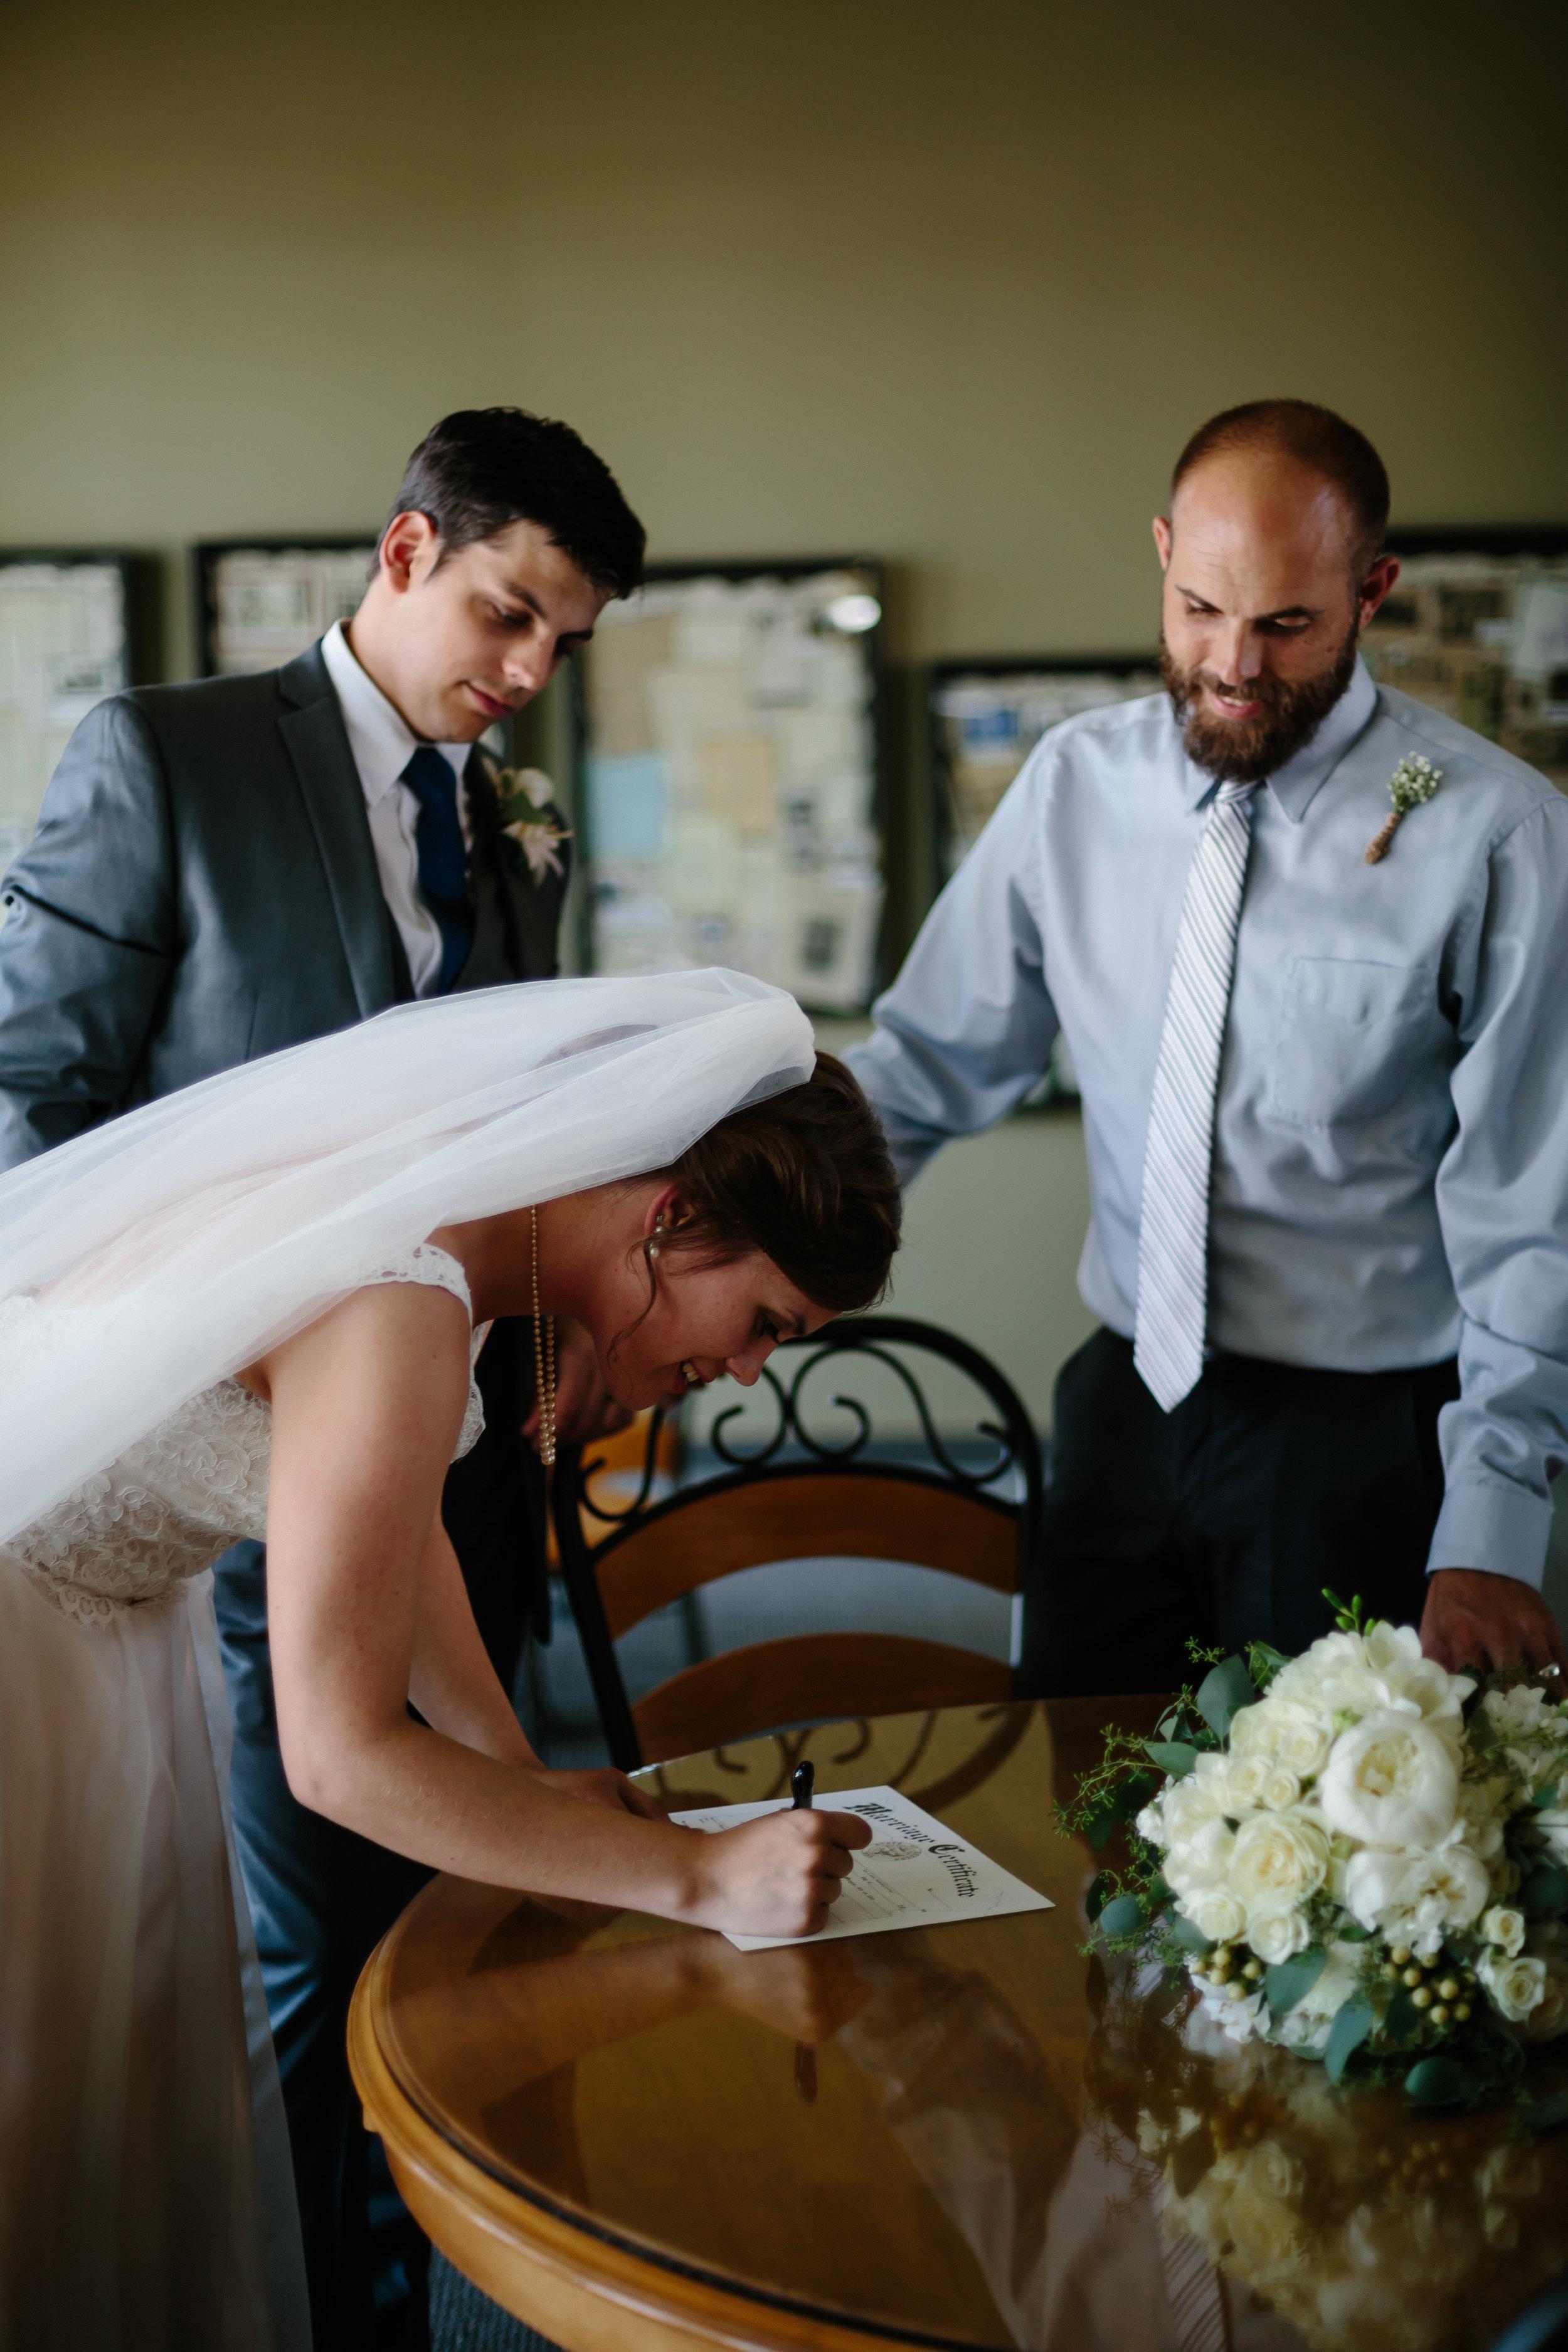 Jordan & Shantel Married - Idaho - Corrie Mick Photography-245.jpg